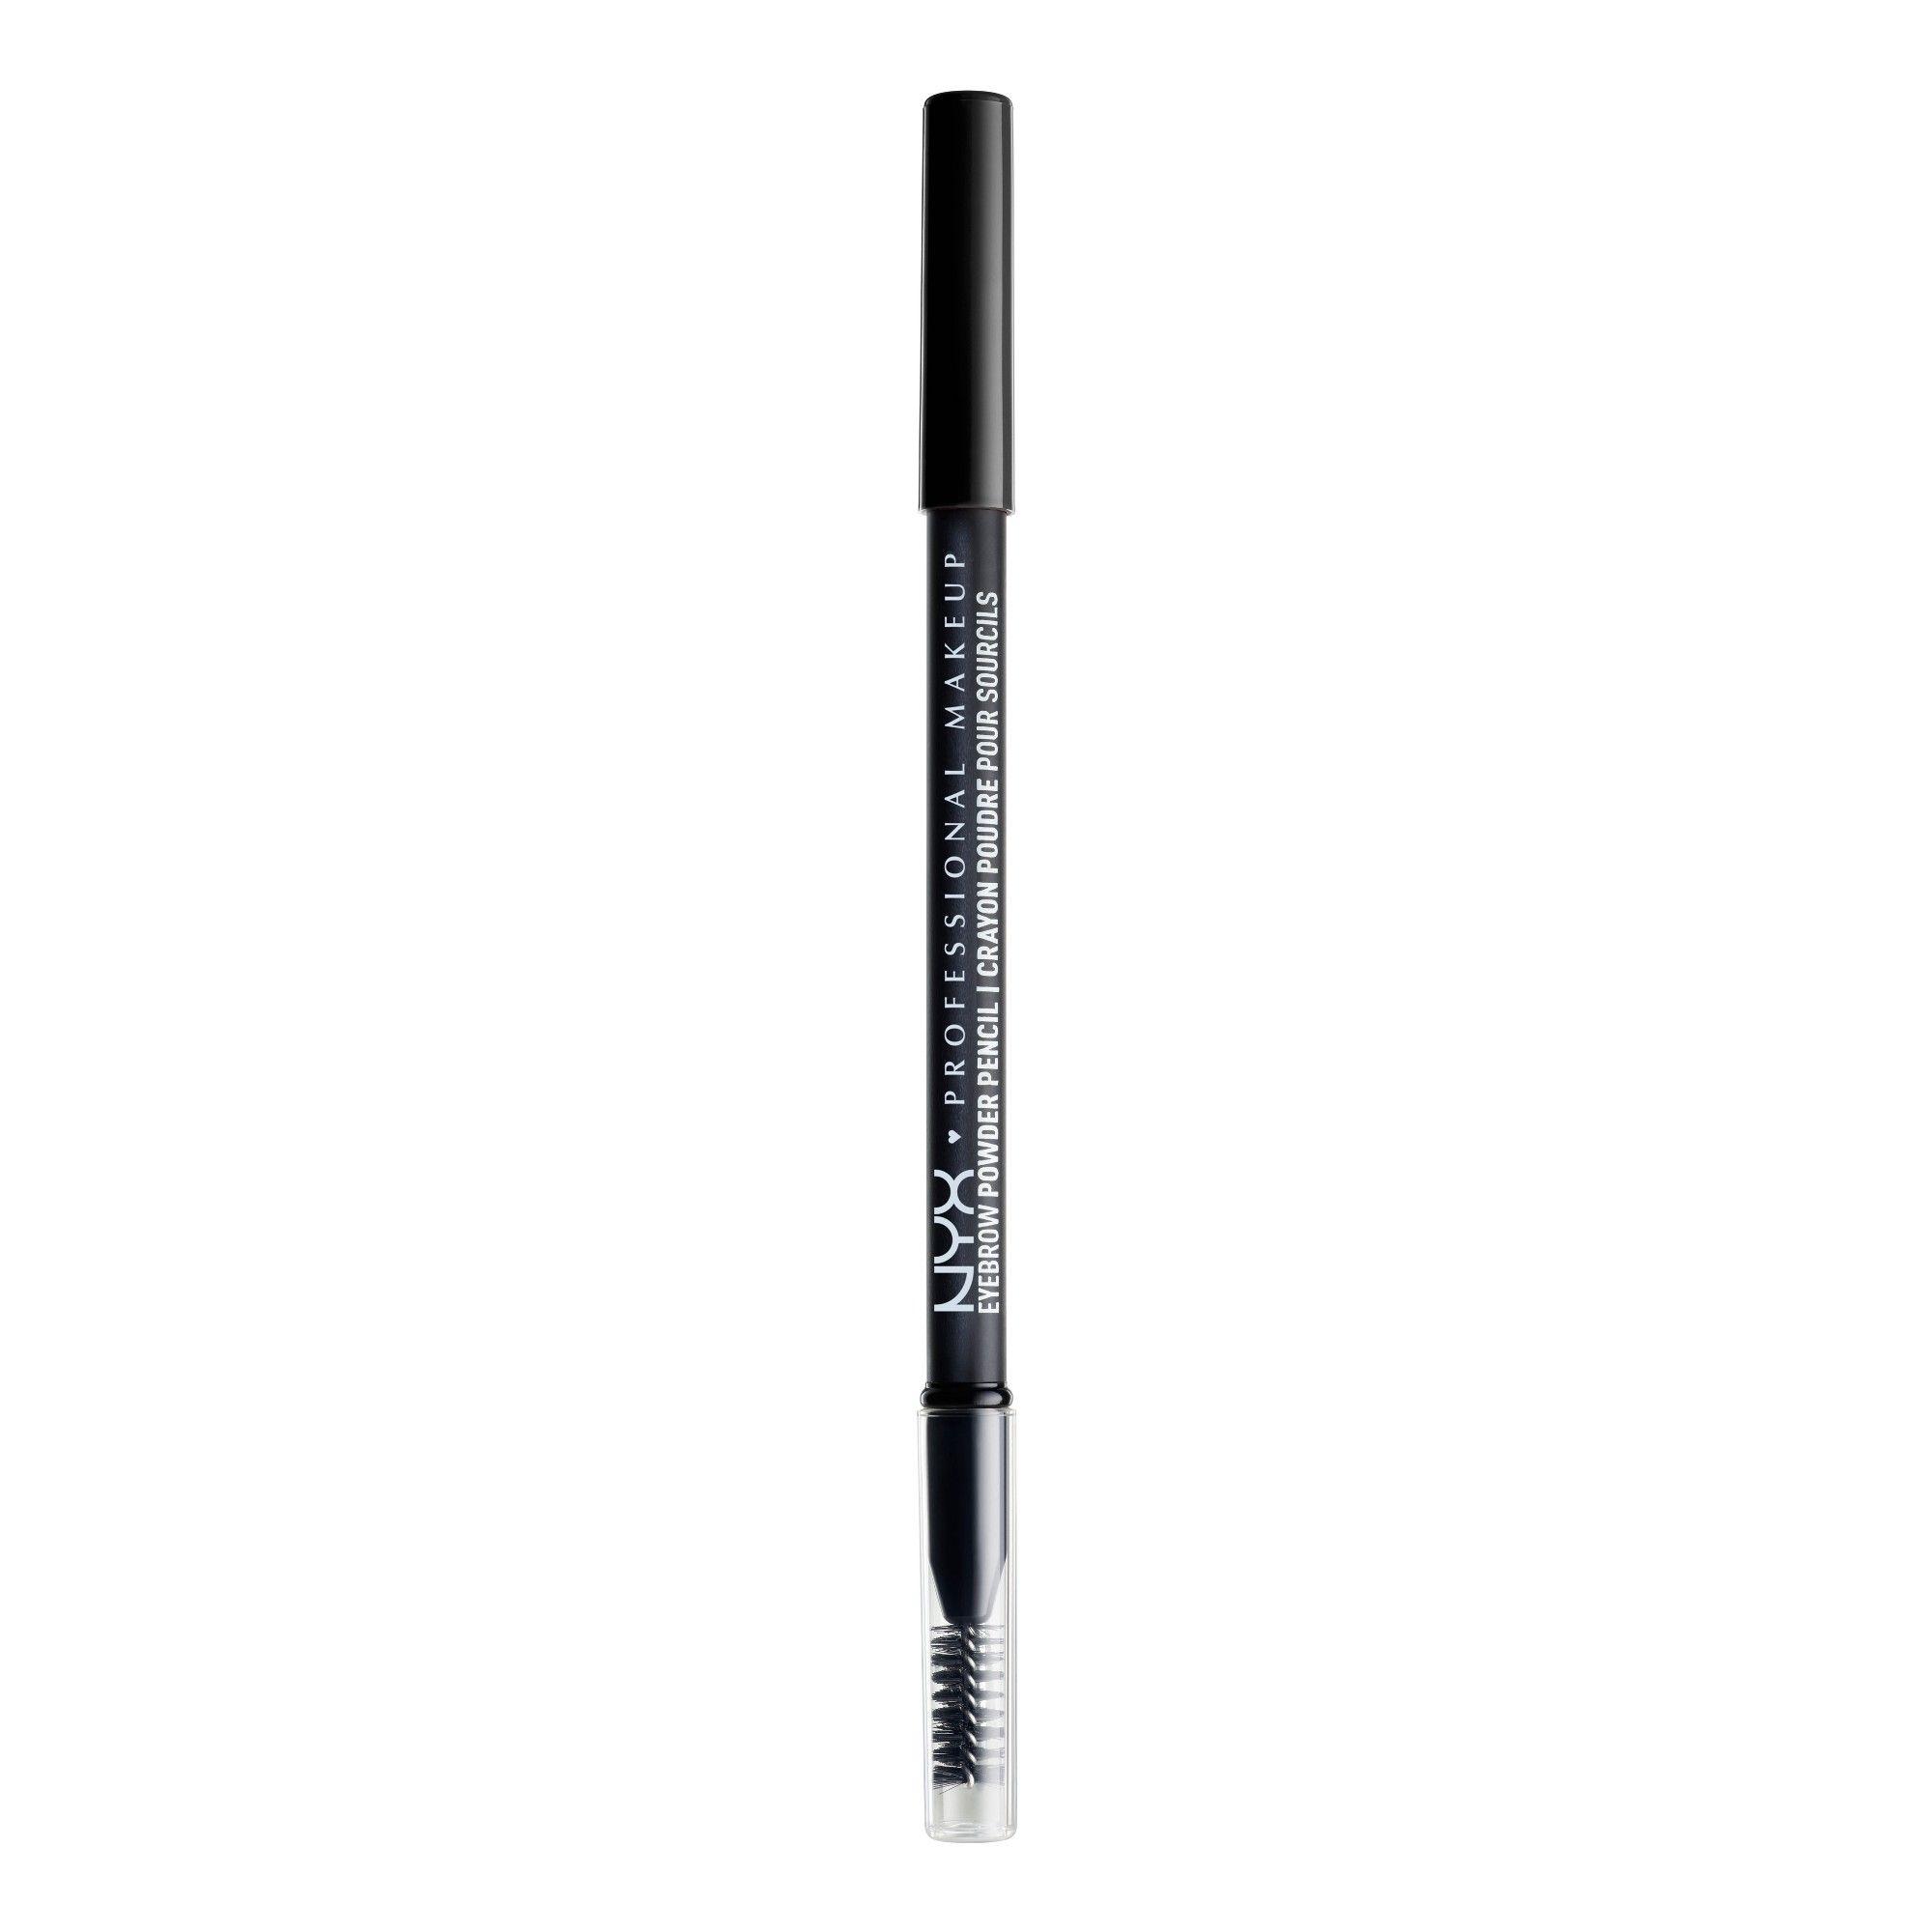 Nyx Professional Makeup Eyebrow Powder Pencil Black 0 05oz